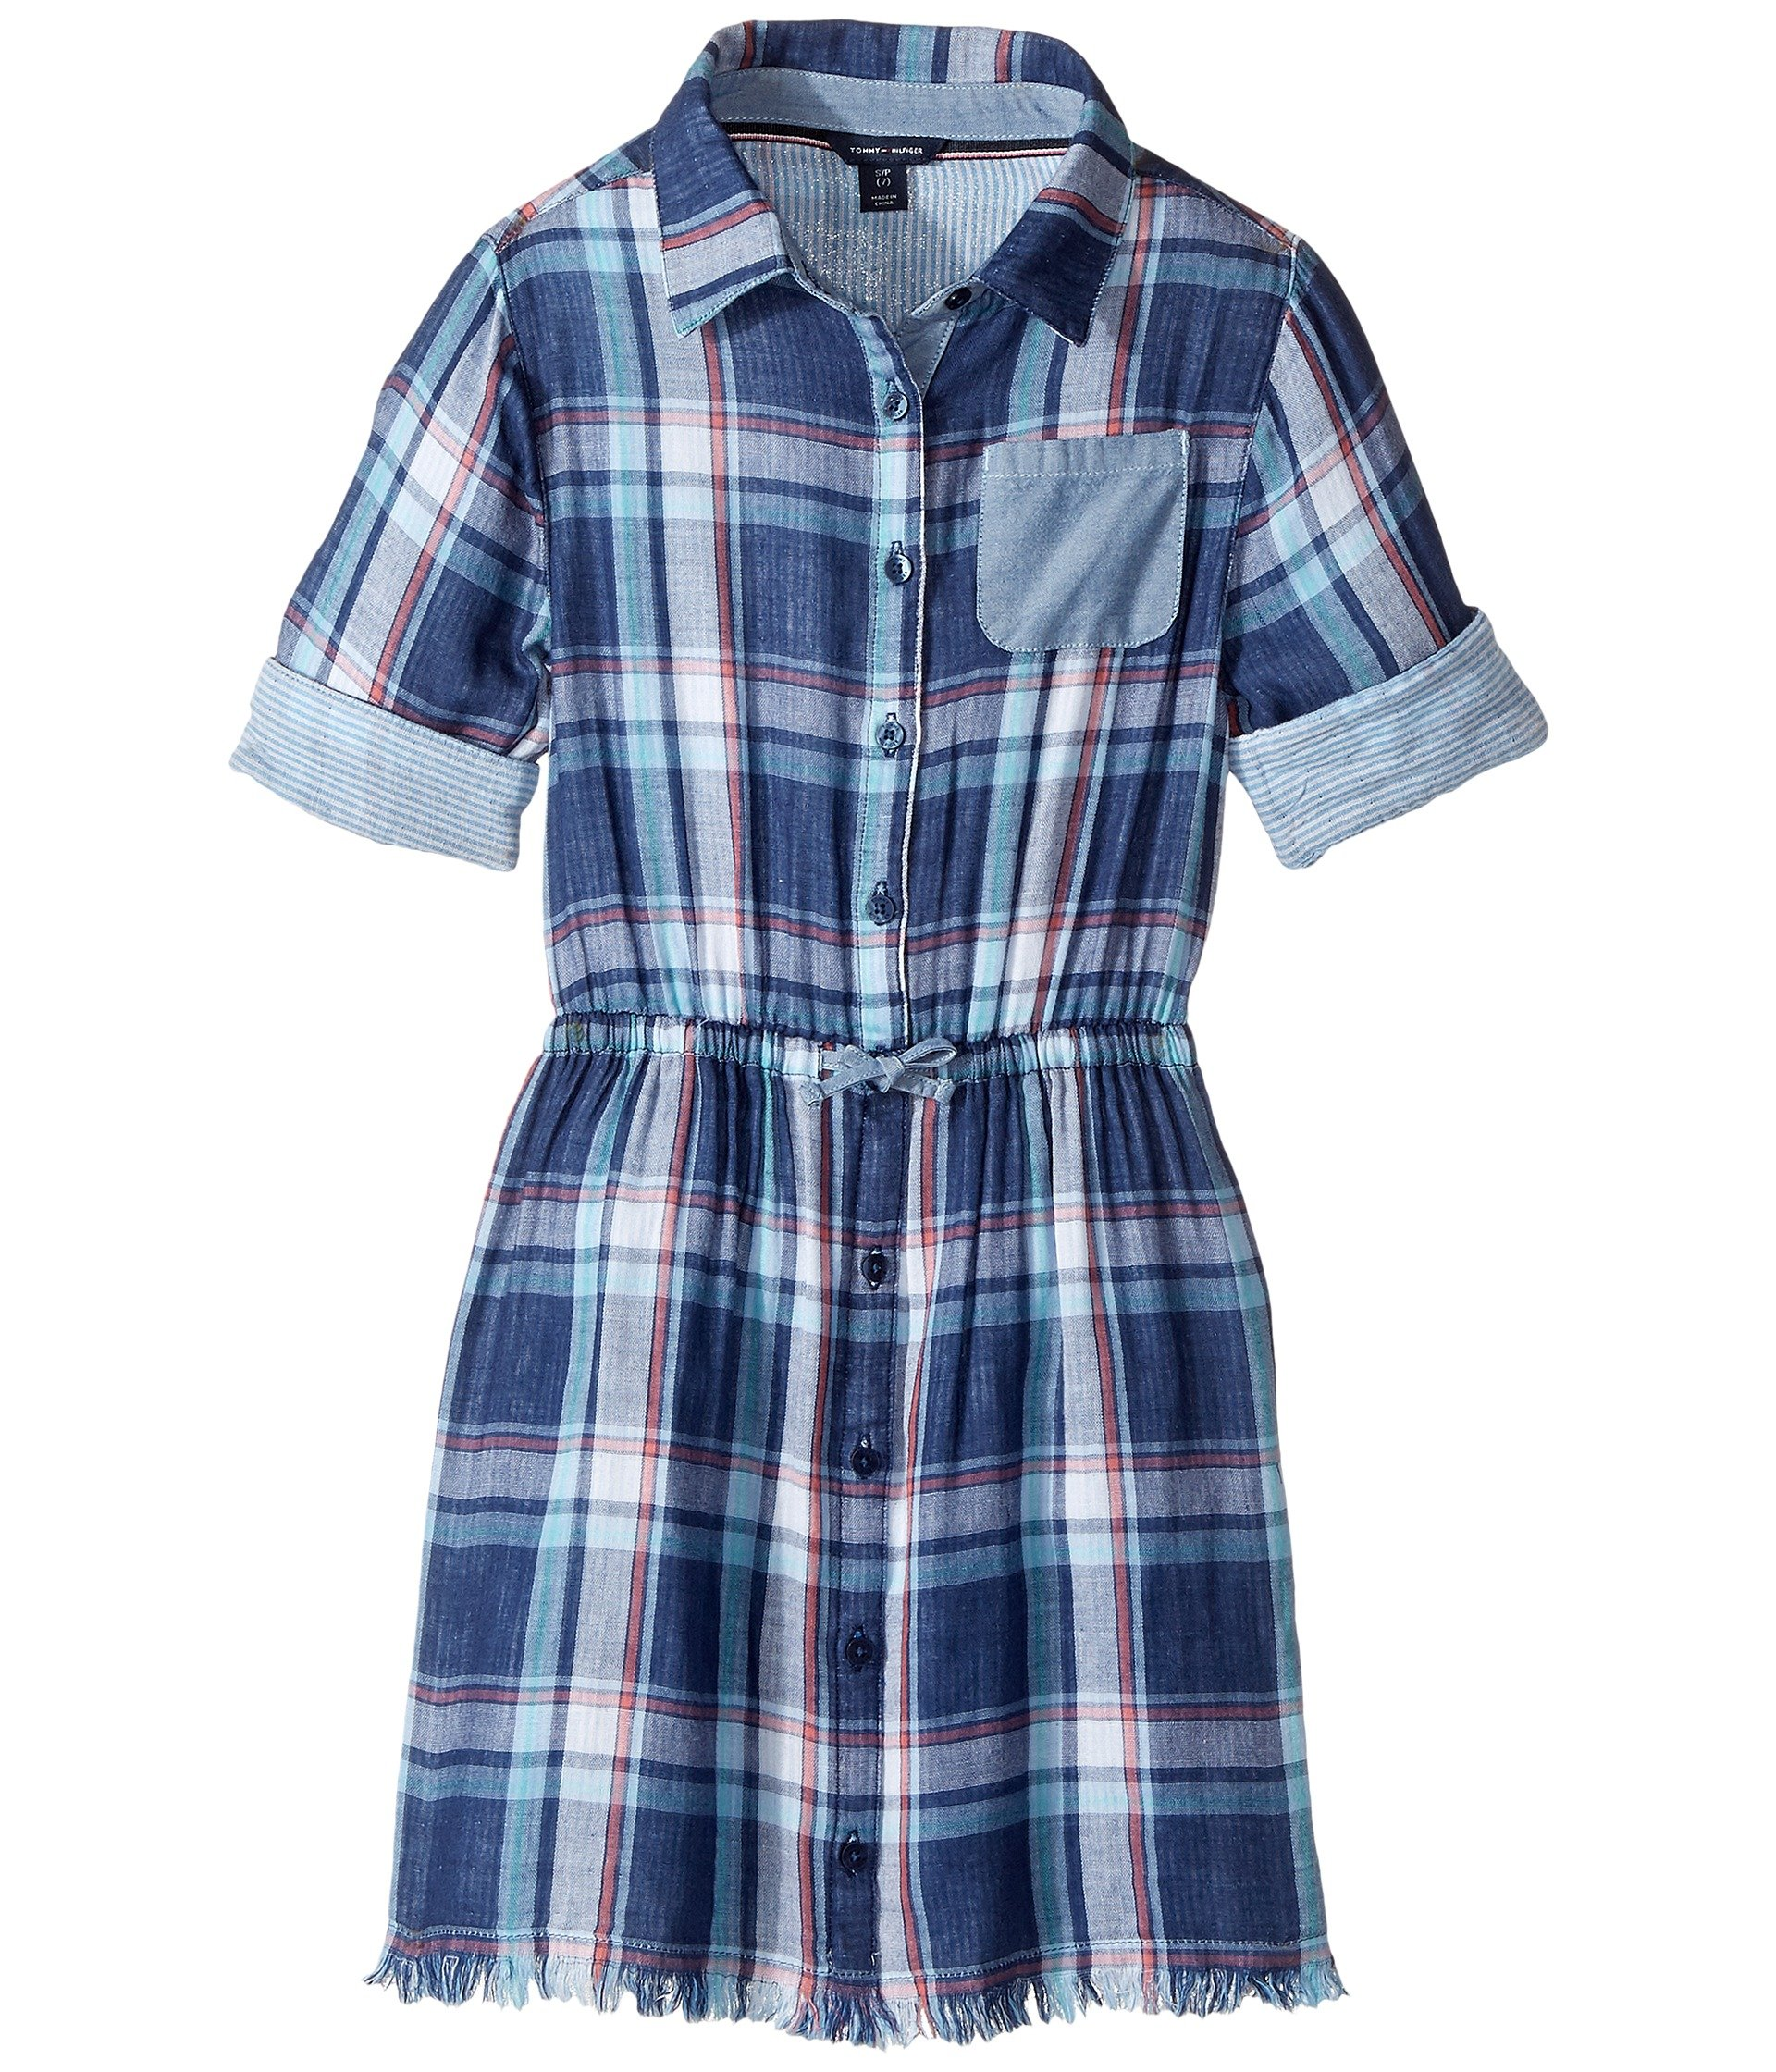 Vestido para Niña Tommy Hilfiger Kids Yarn-Dye Plaid Shirtdress (Big Kids)  + Tommy Hilfiger en VeoyCompro.net